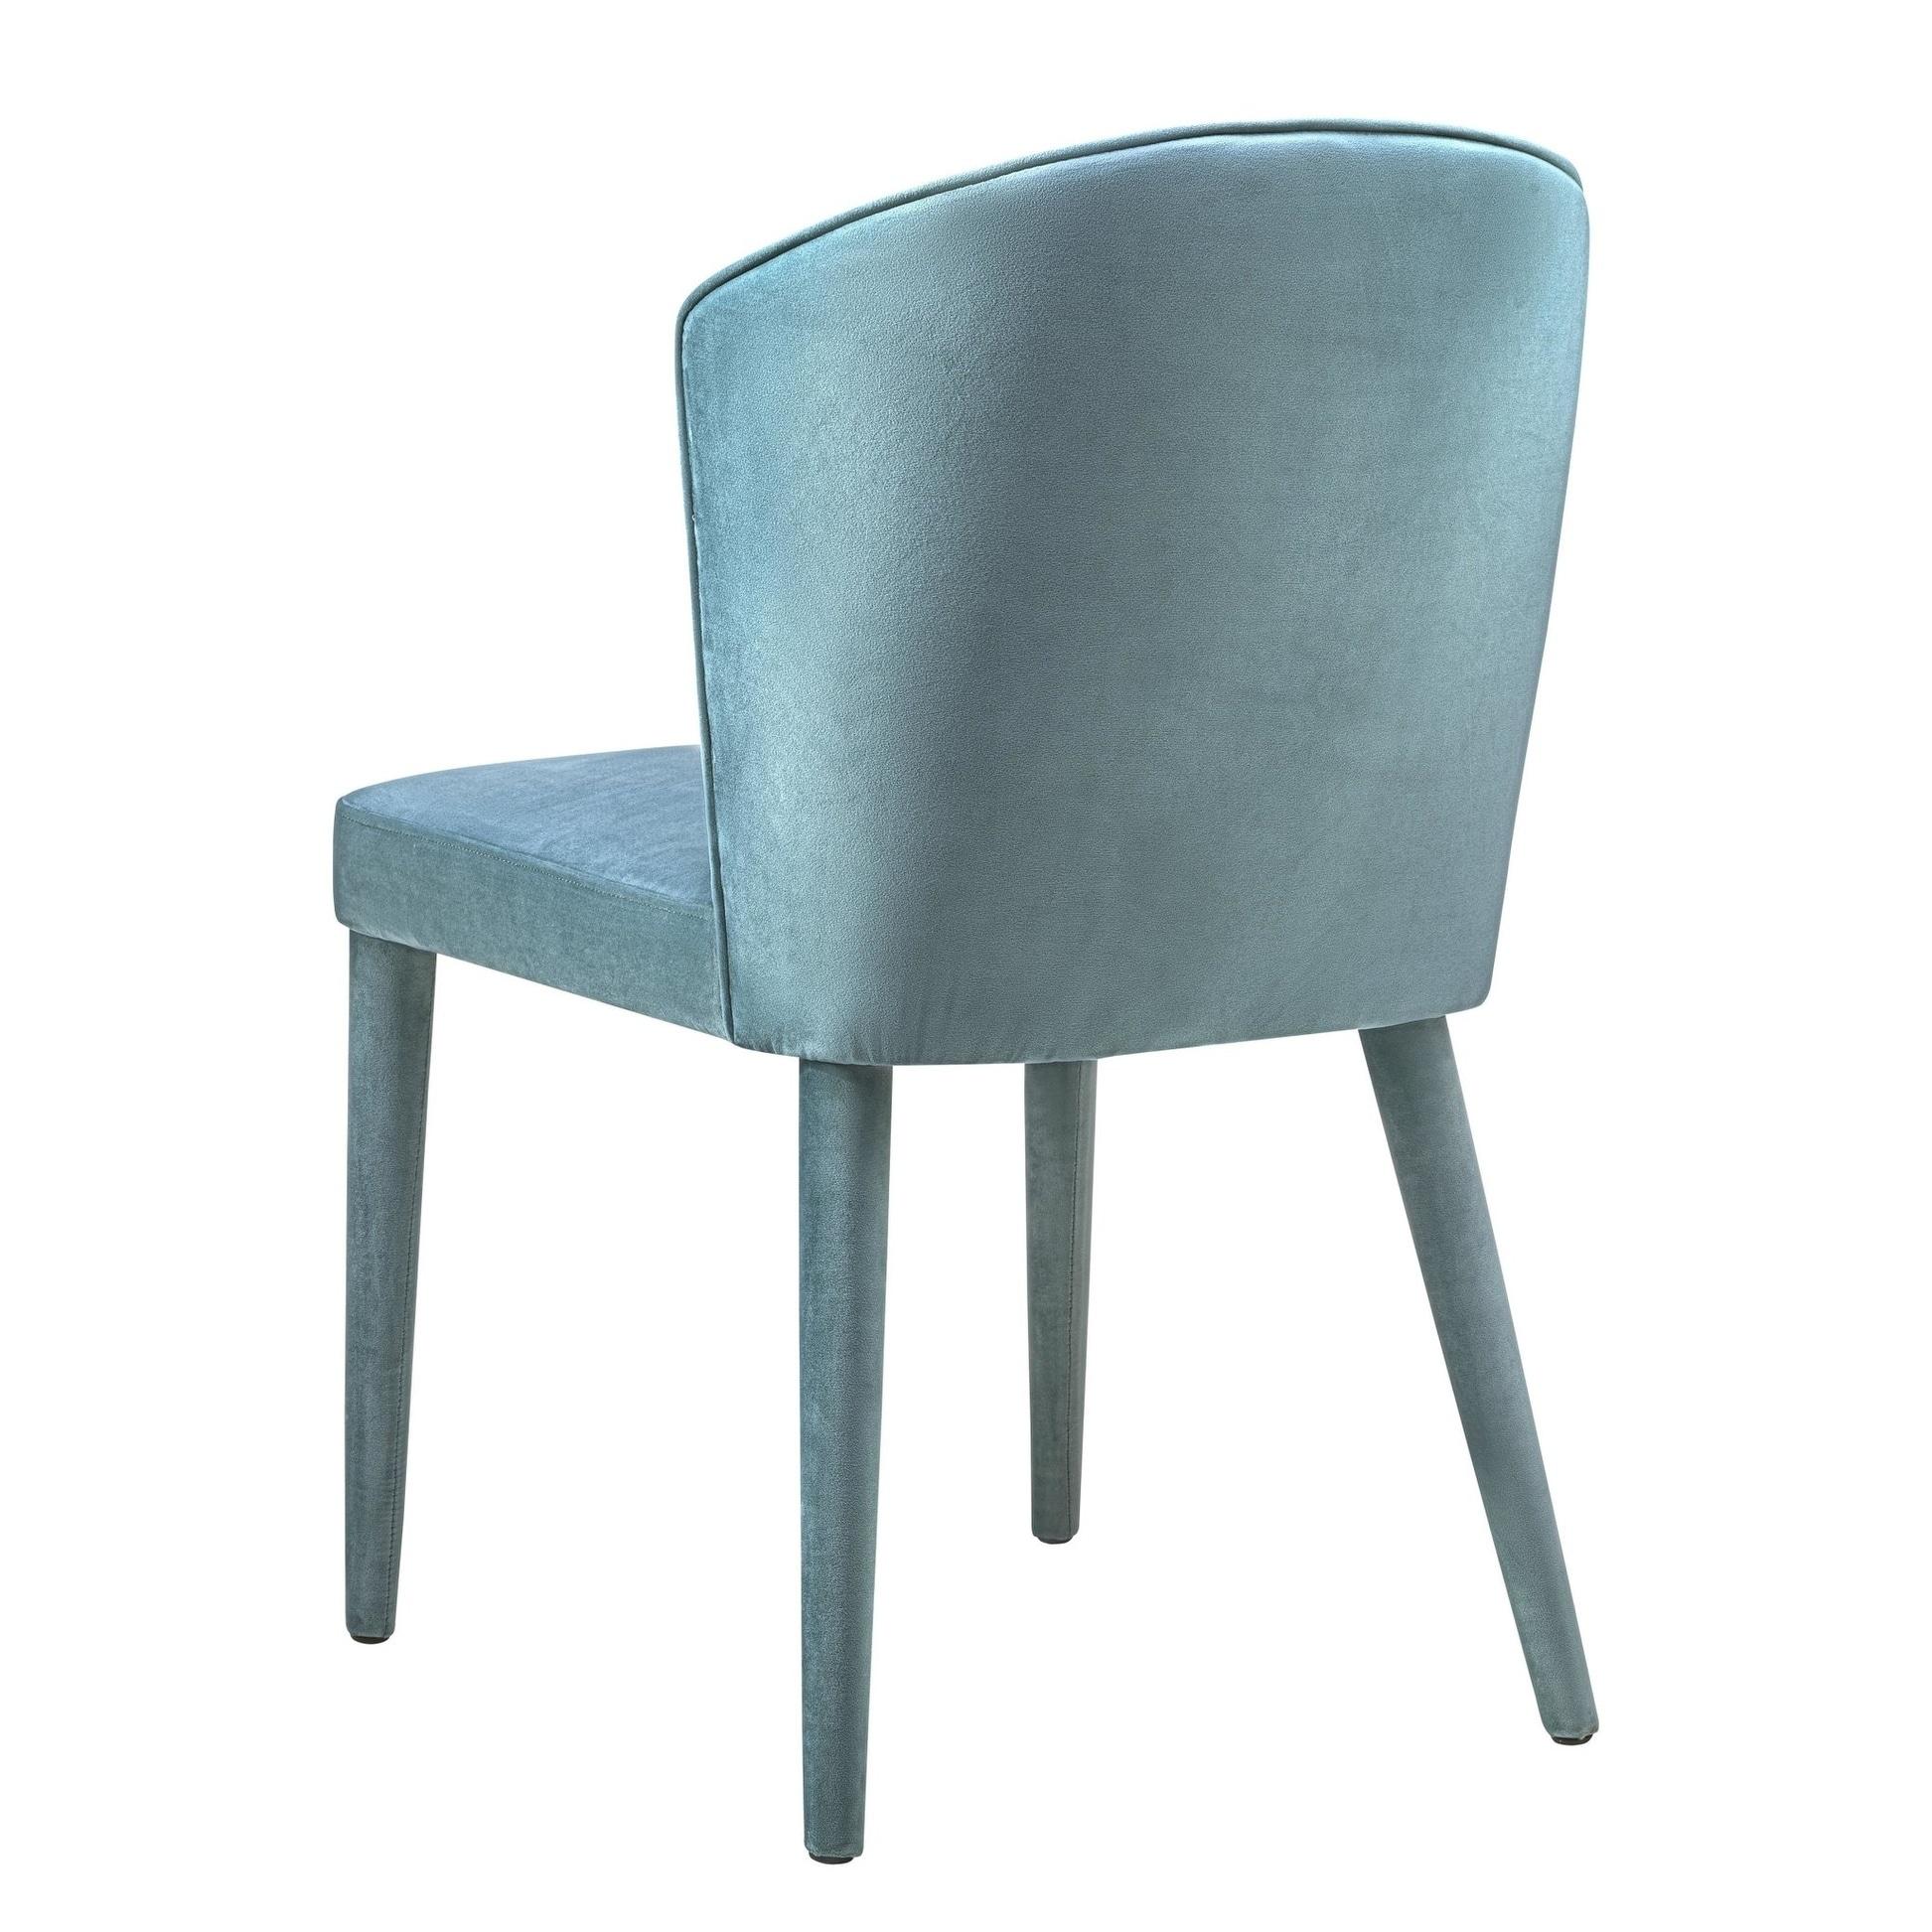 Shop Metropolitan Sea Blue Velvet Chair   Free Shipping Today    Overstock.com   18533743